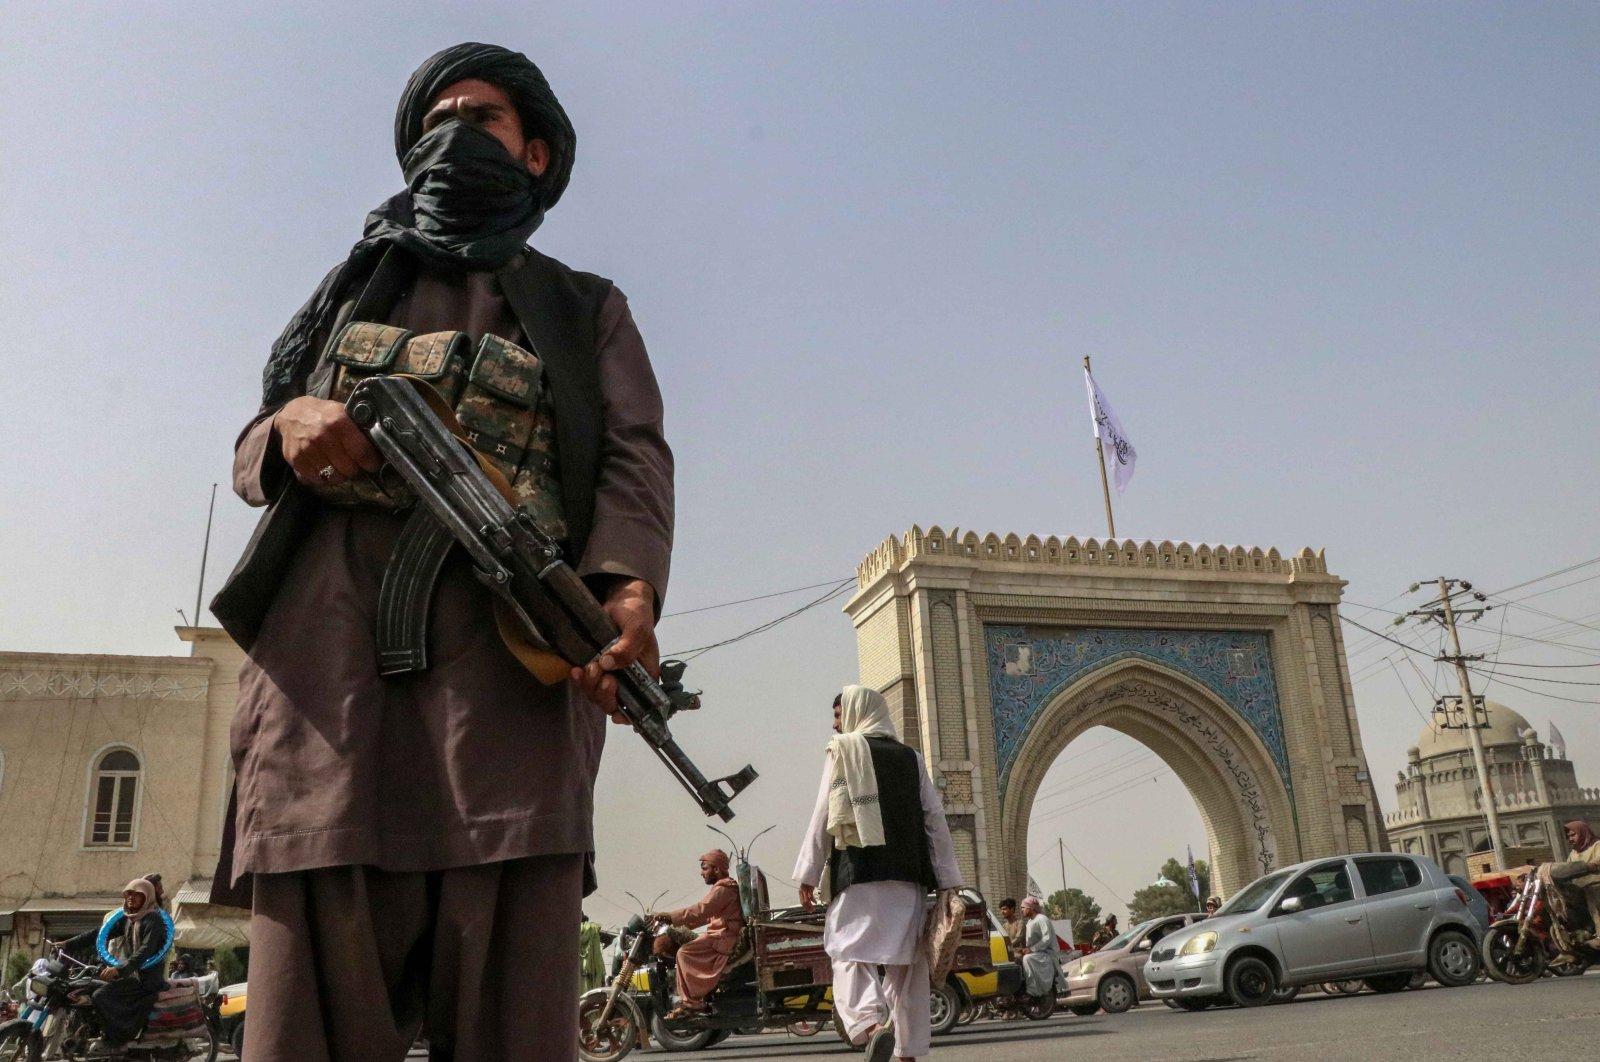 Taliban fighter patrols in Kandahar, Afghanistan, Aug. 17, 2021. (EPA Photo)